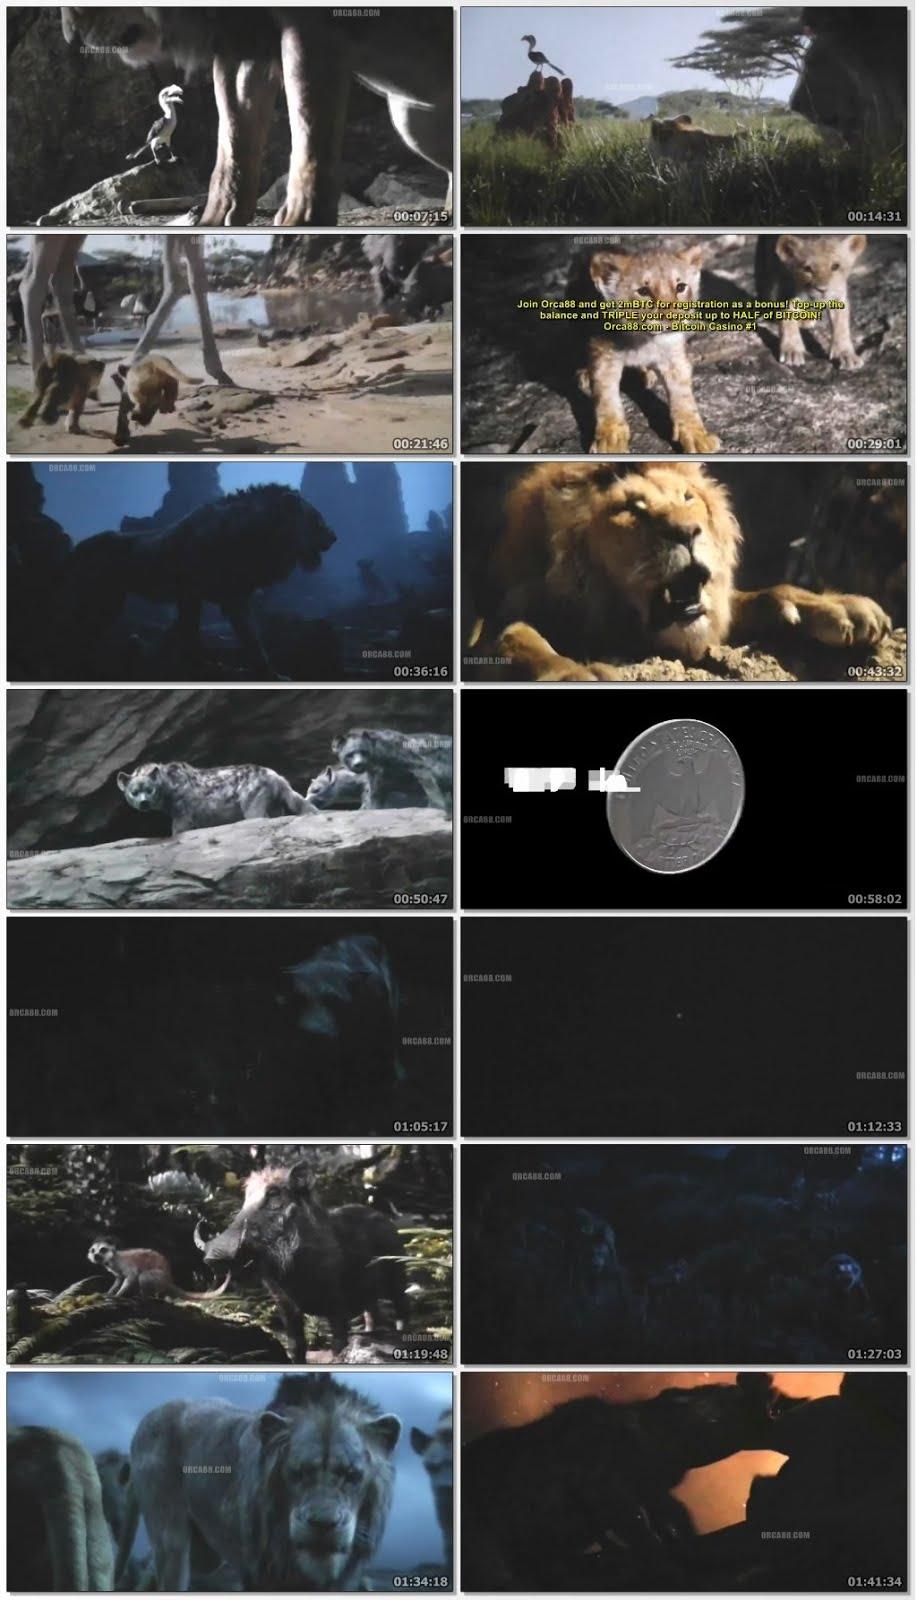 The Lion King 2019 Dual Audio Hindi 480p New HDTCRip 400MB